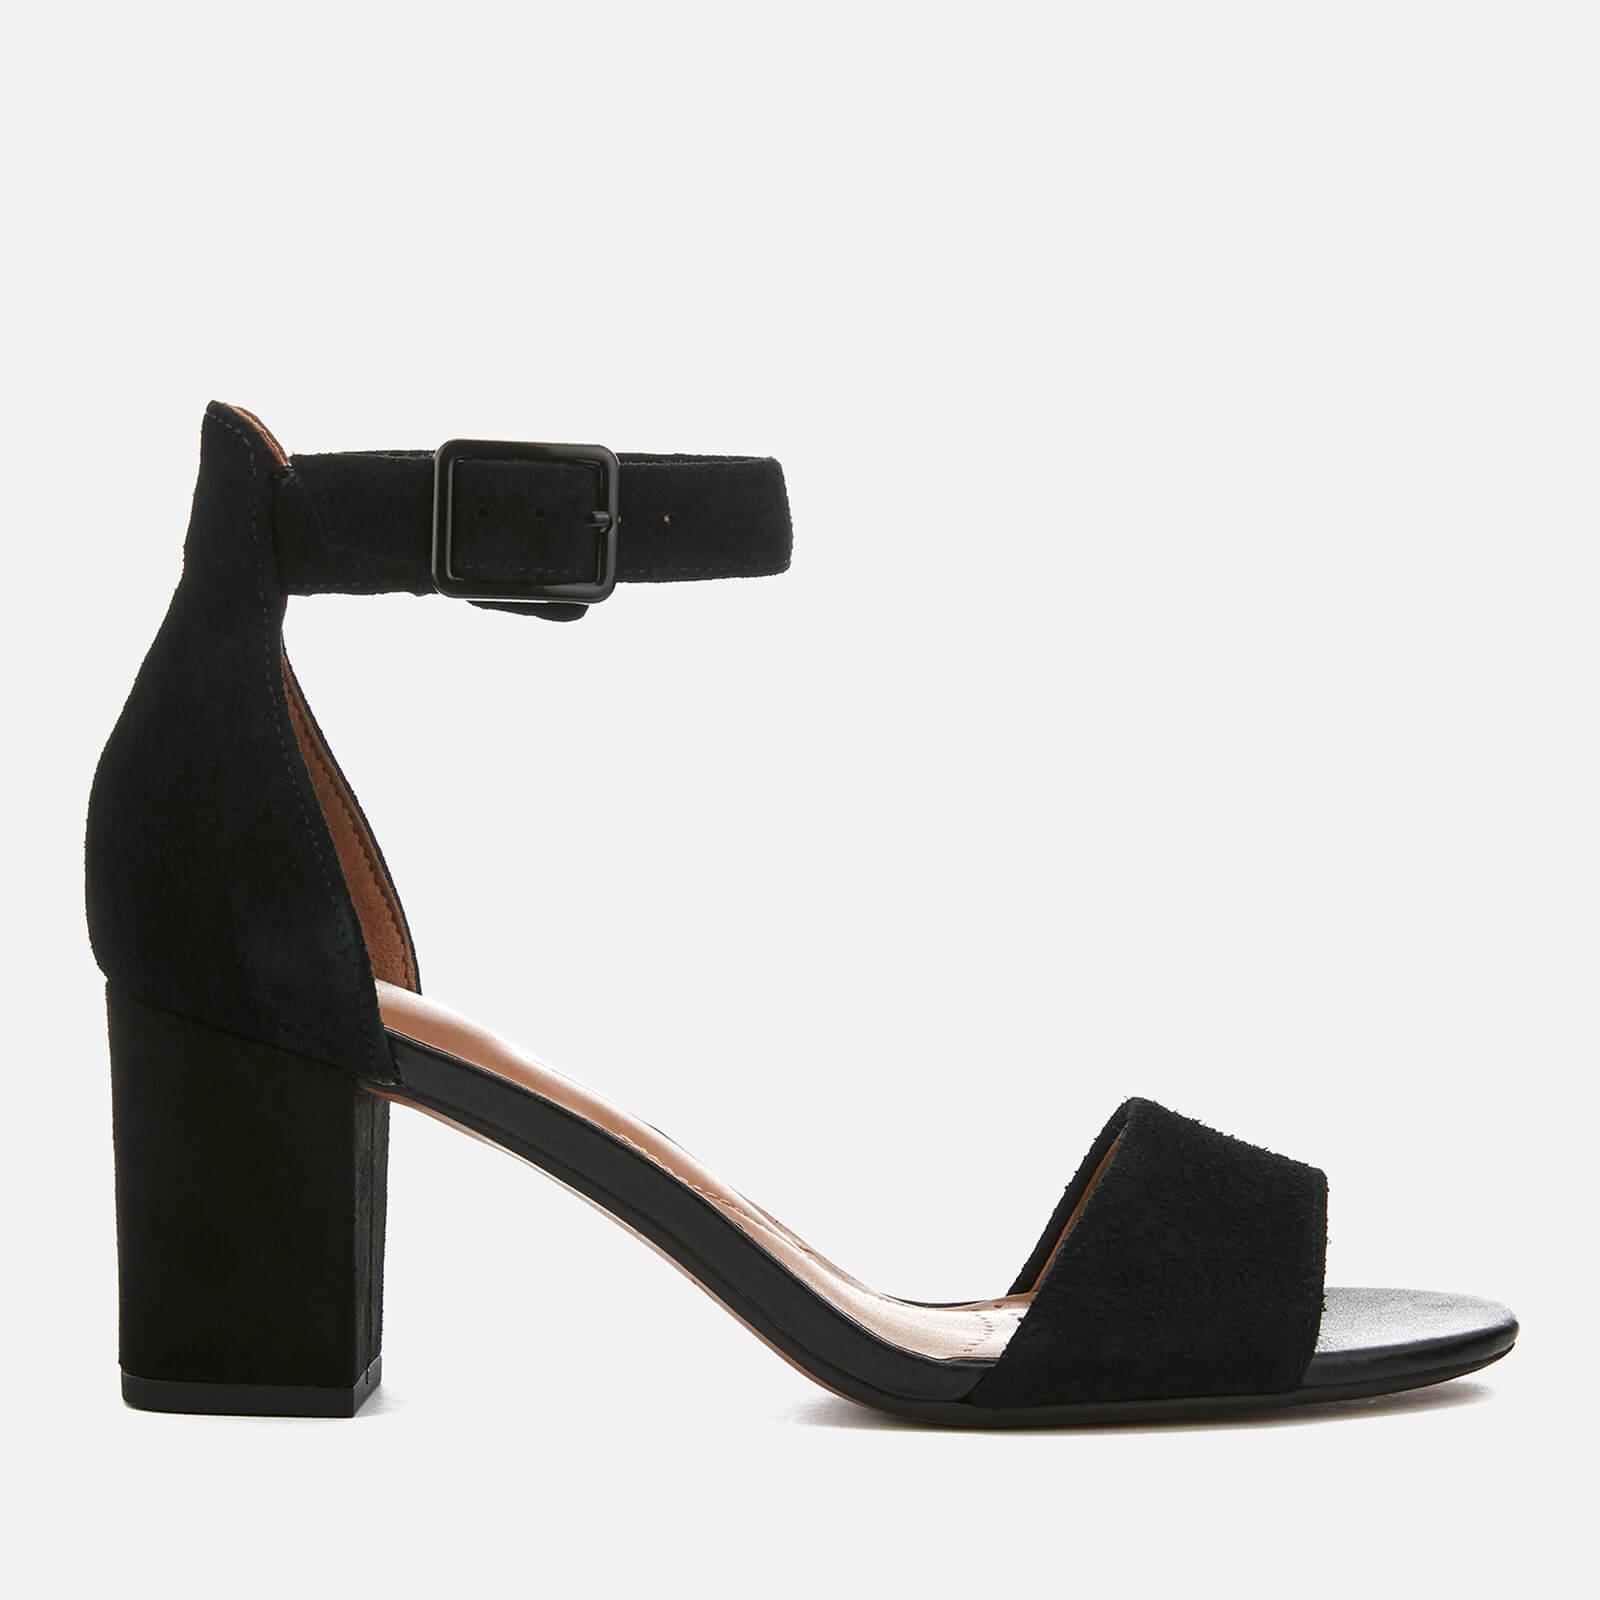 3454380c5 Clarks Women's Deva Mae Suede Blocked Heeled Sandals - Black | FREE UK  Delivery | Allsole